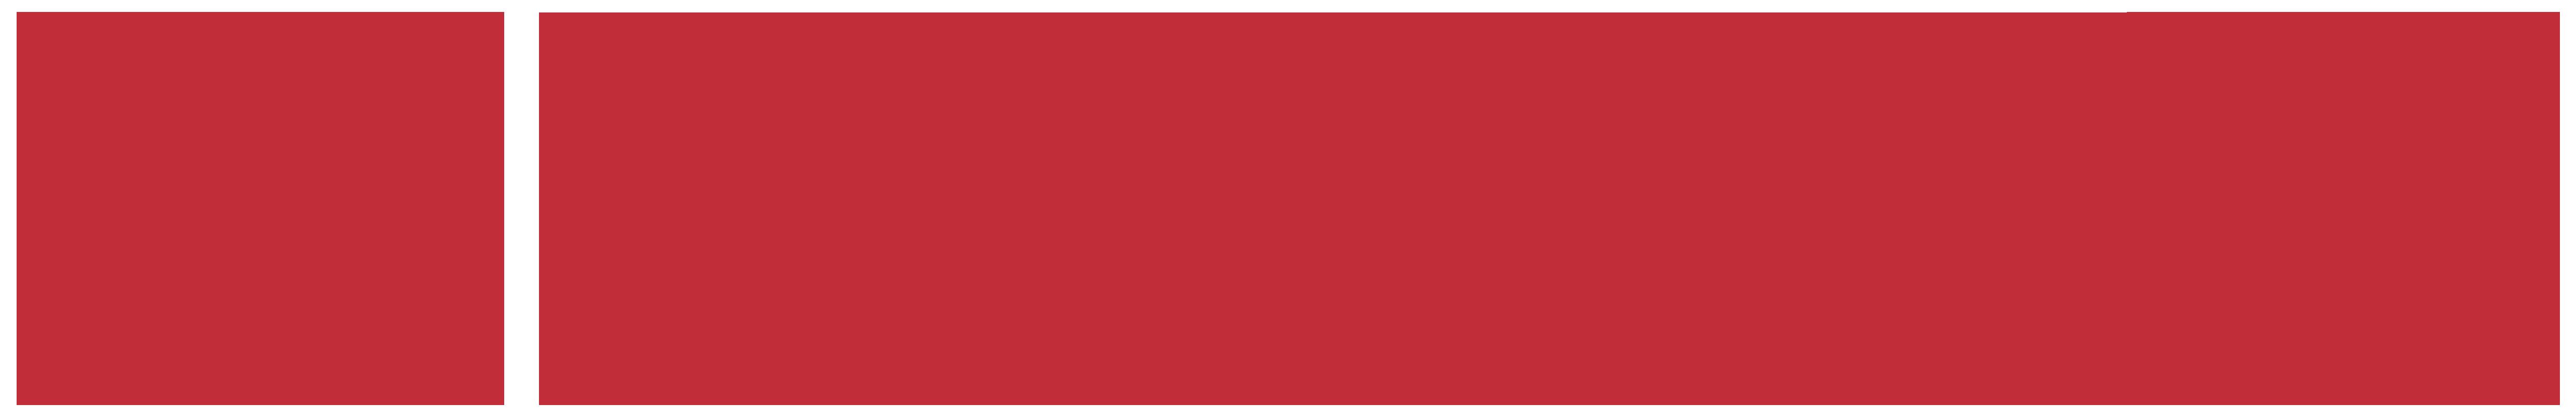 ELOCK2_Zutrittskontrolle